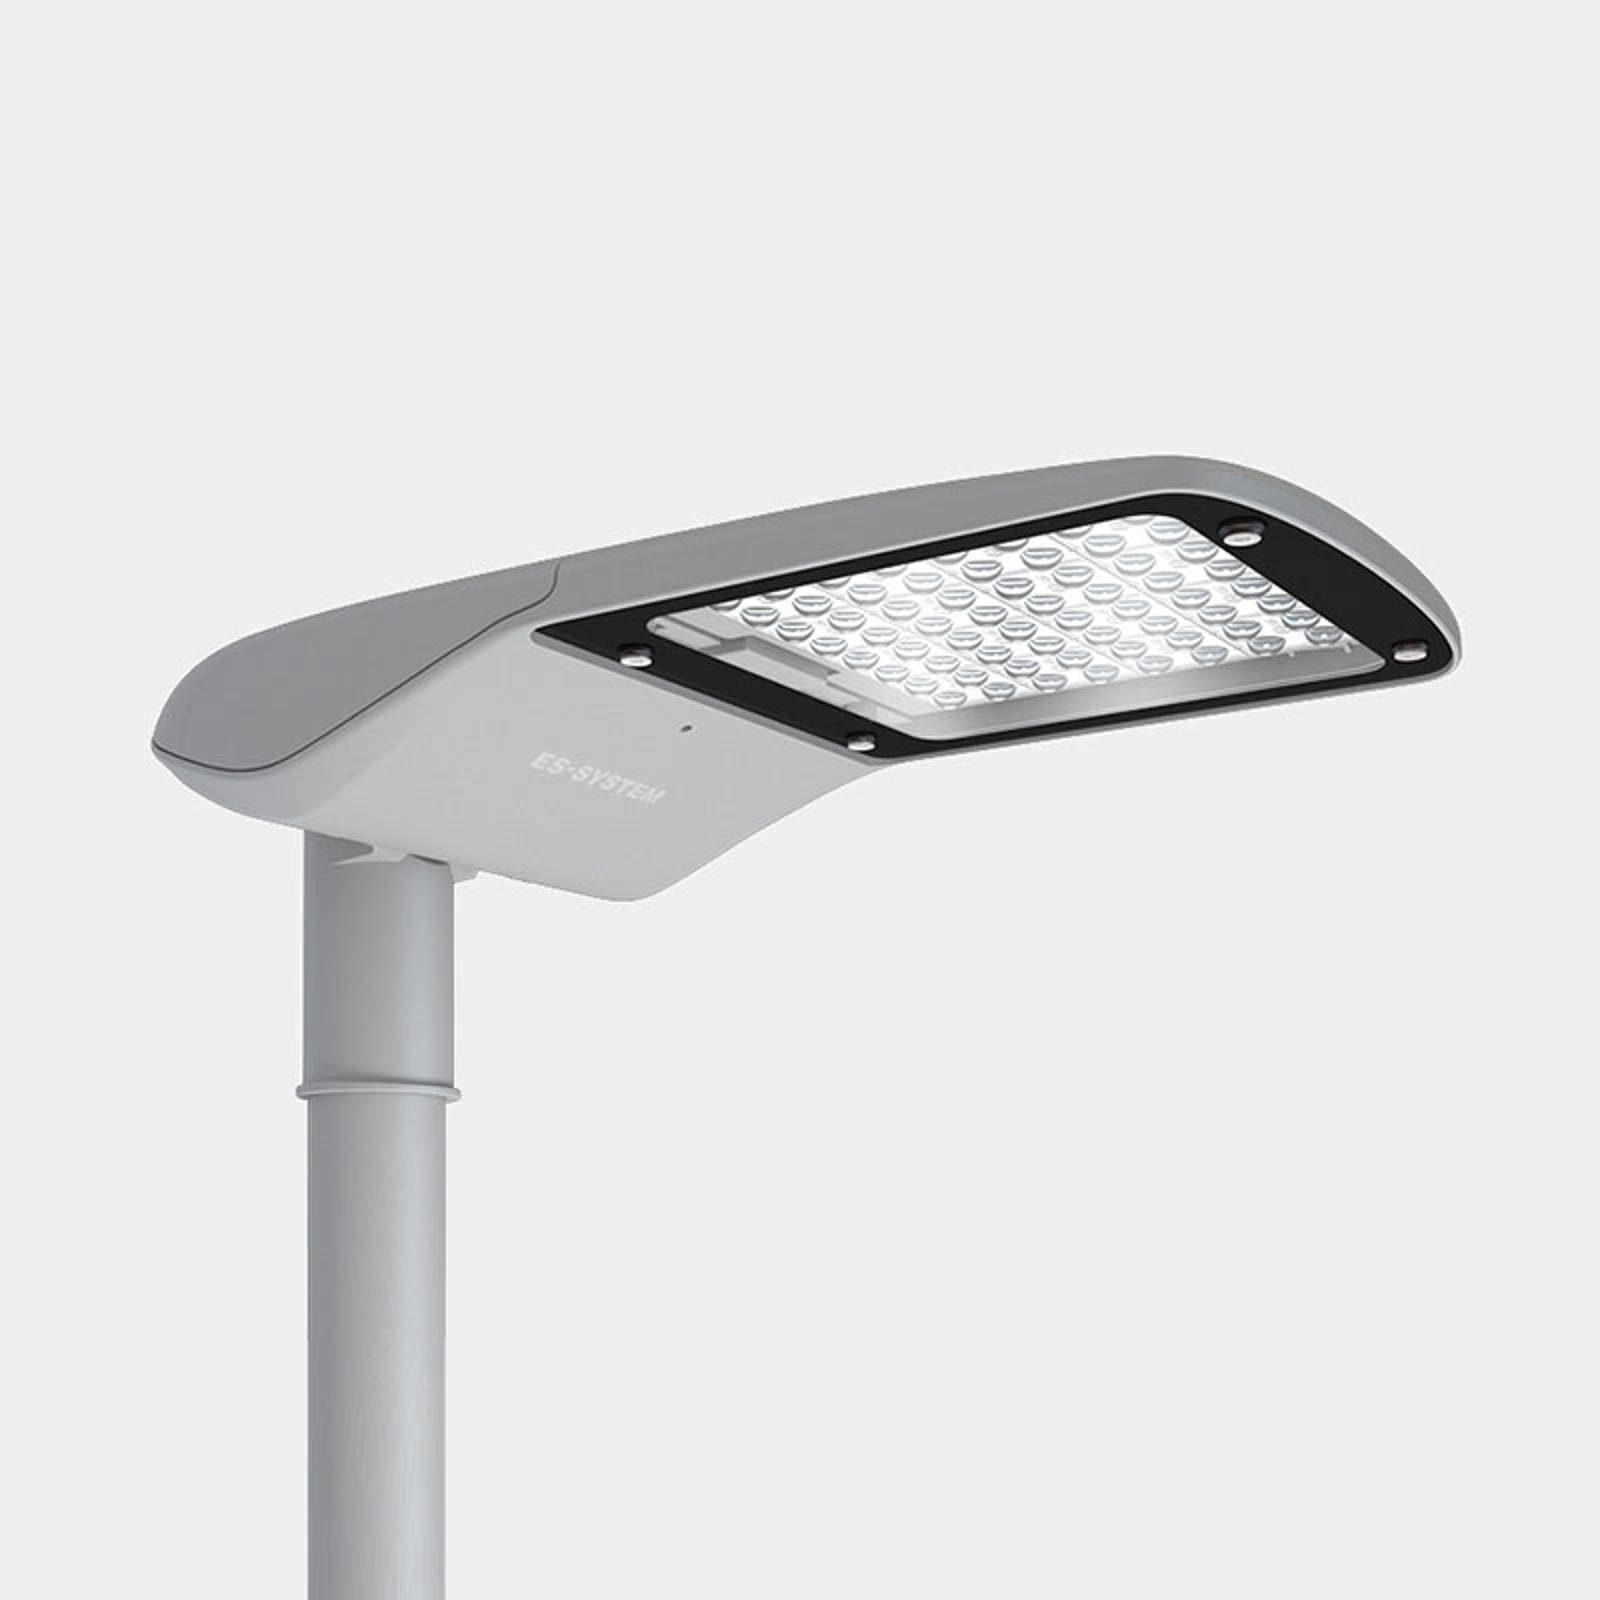 Proiettore LED Sprinter wideflood 740 100W